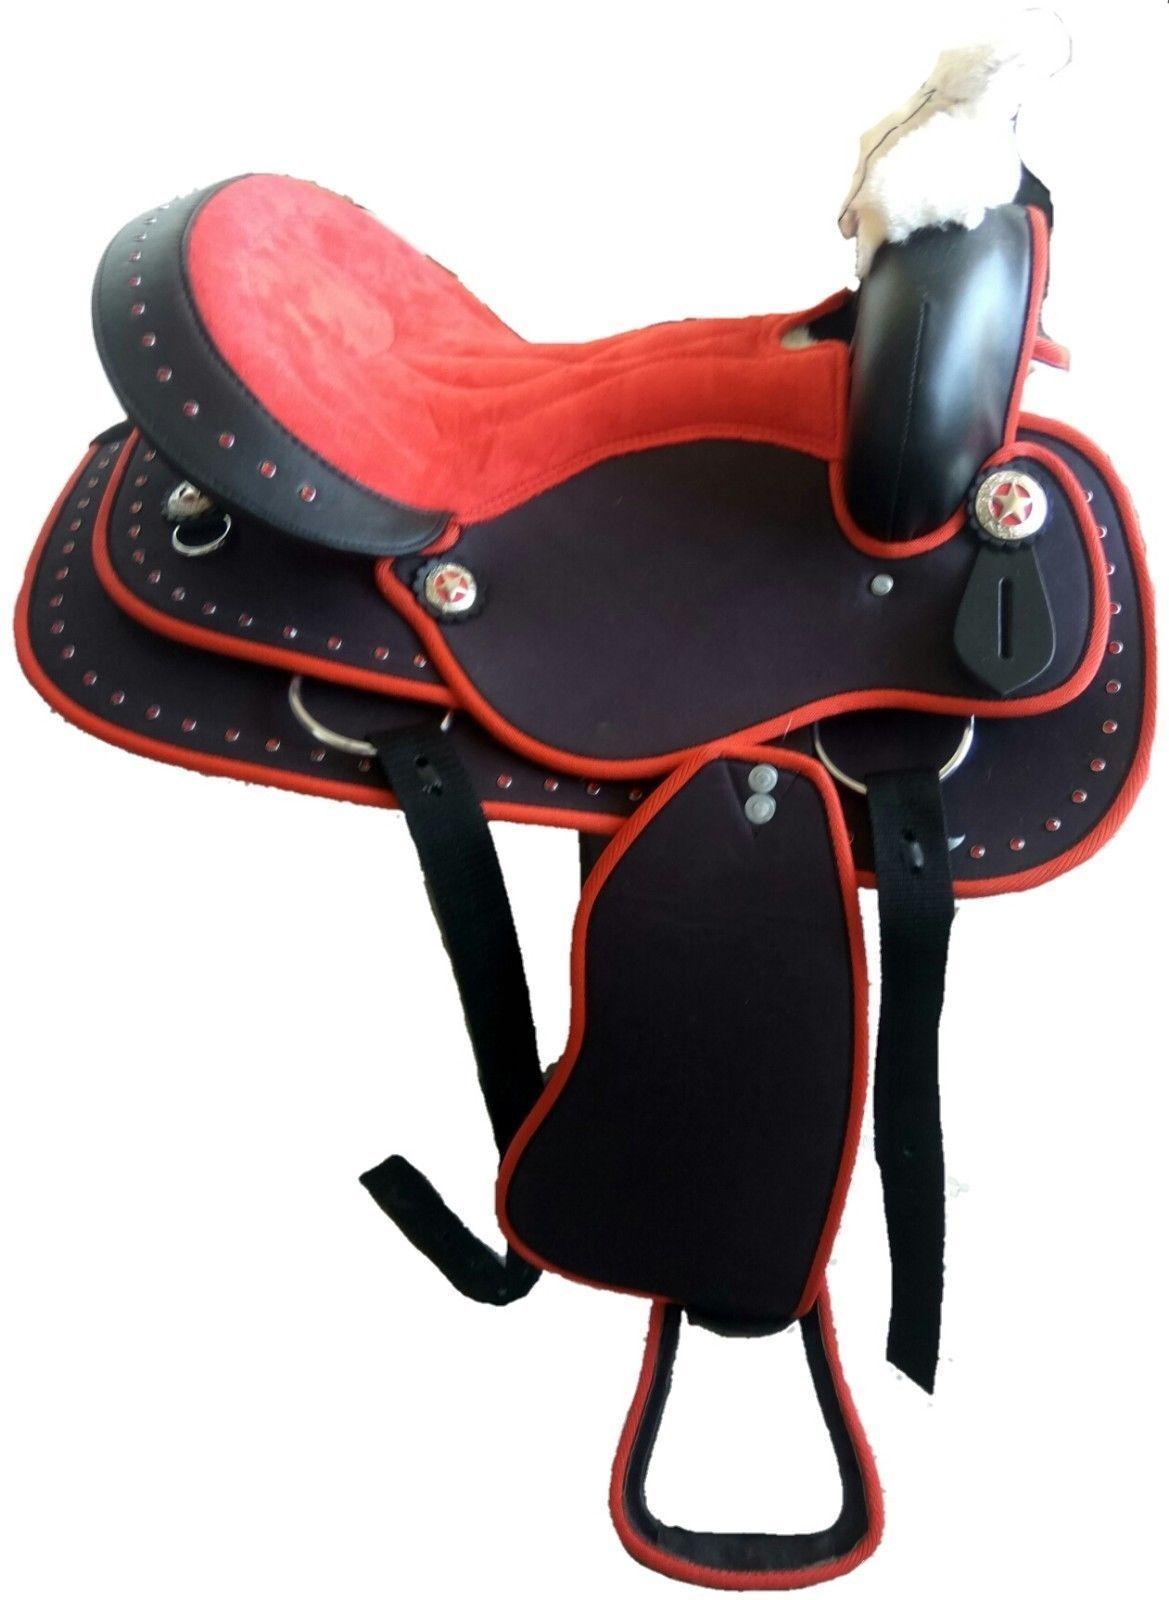 New Western rosso Cordura Pleasure Trail Barrel Racing Horse Saddle Free Shipping